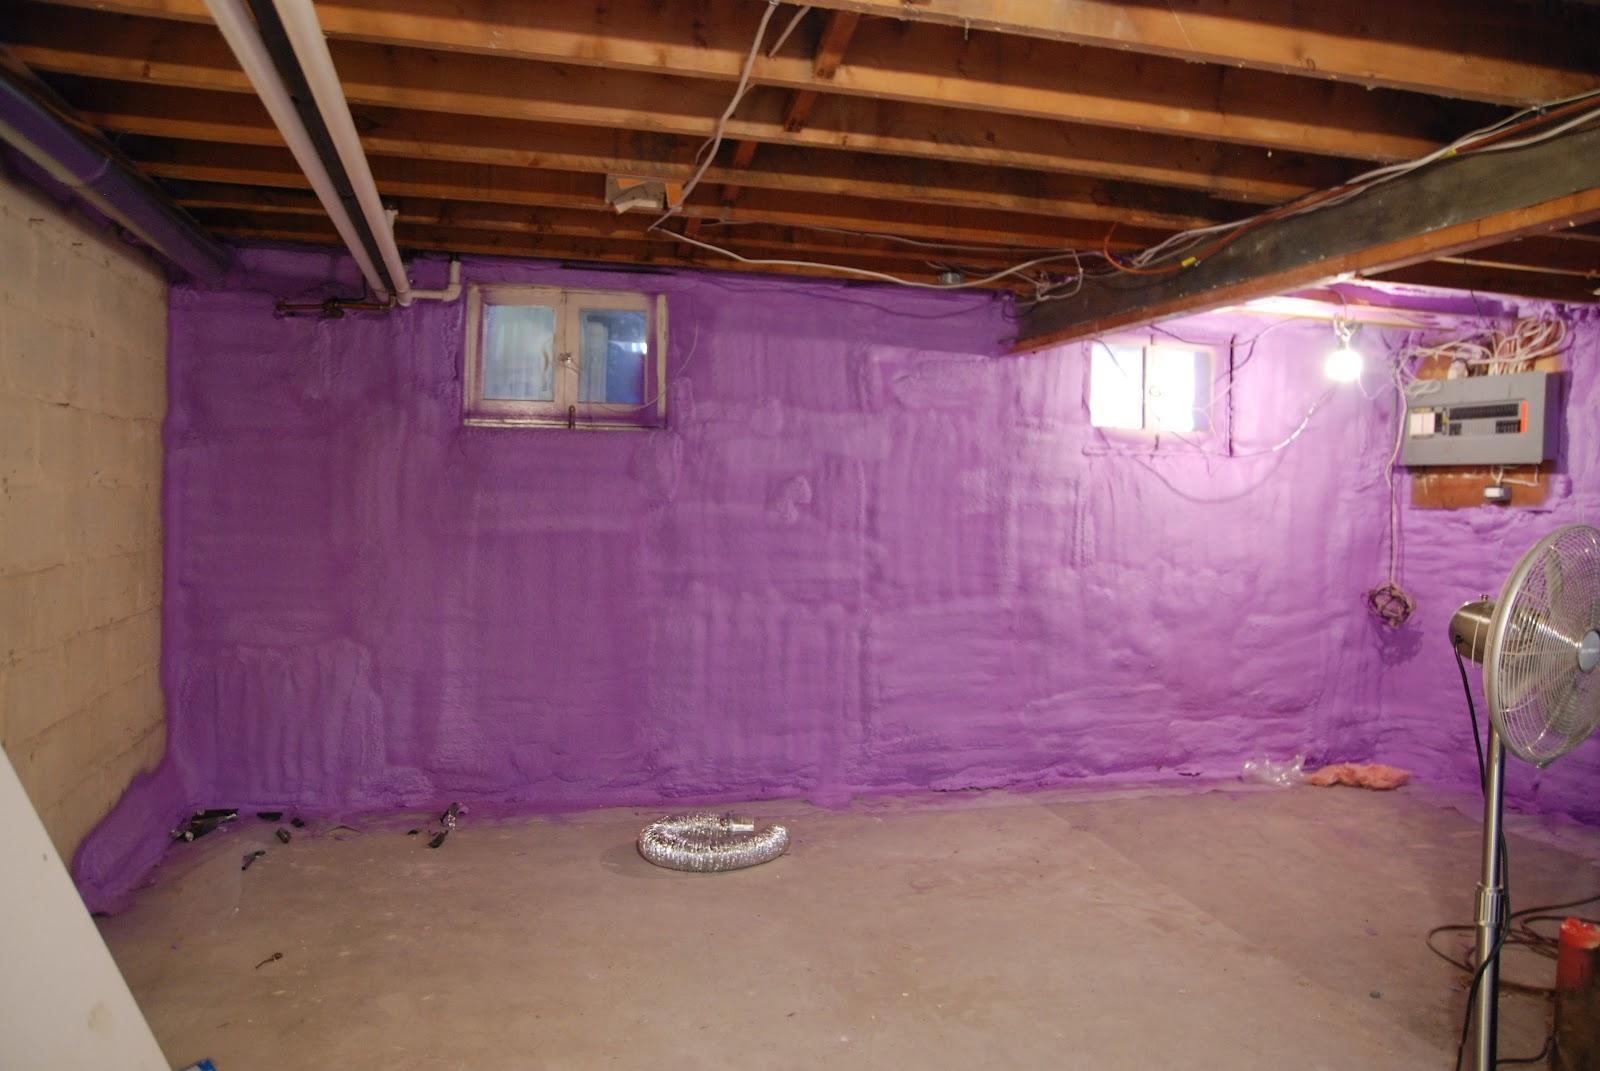 Spray Insulation On Basement Walls